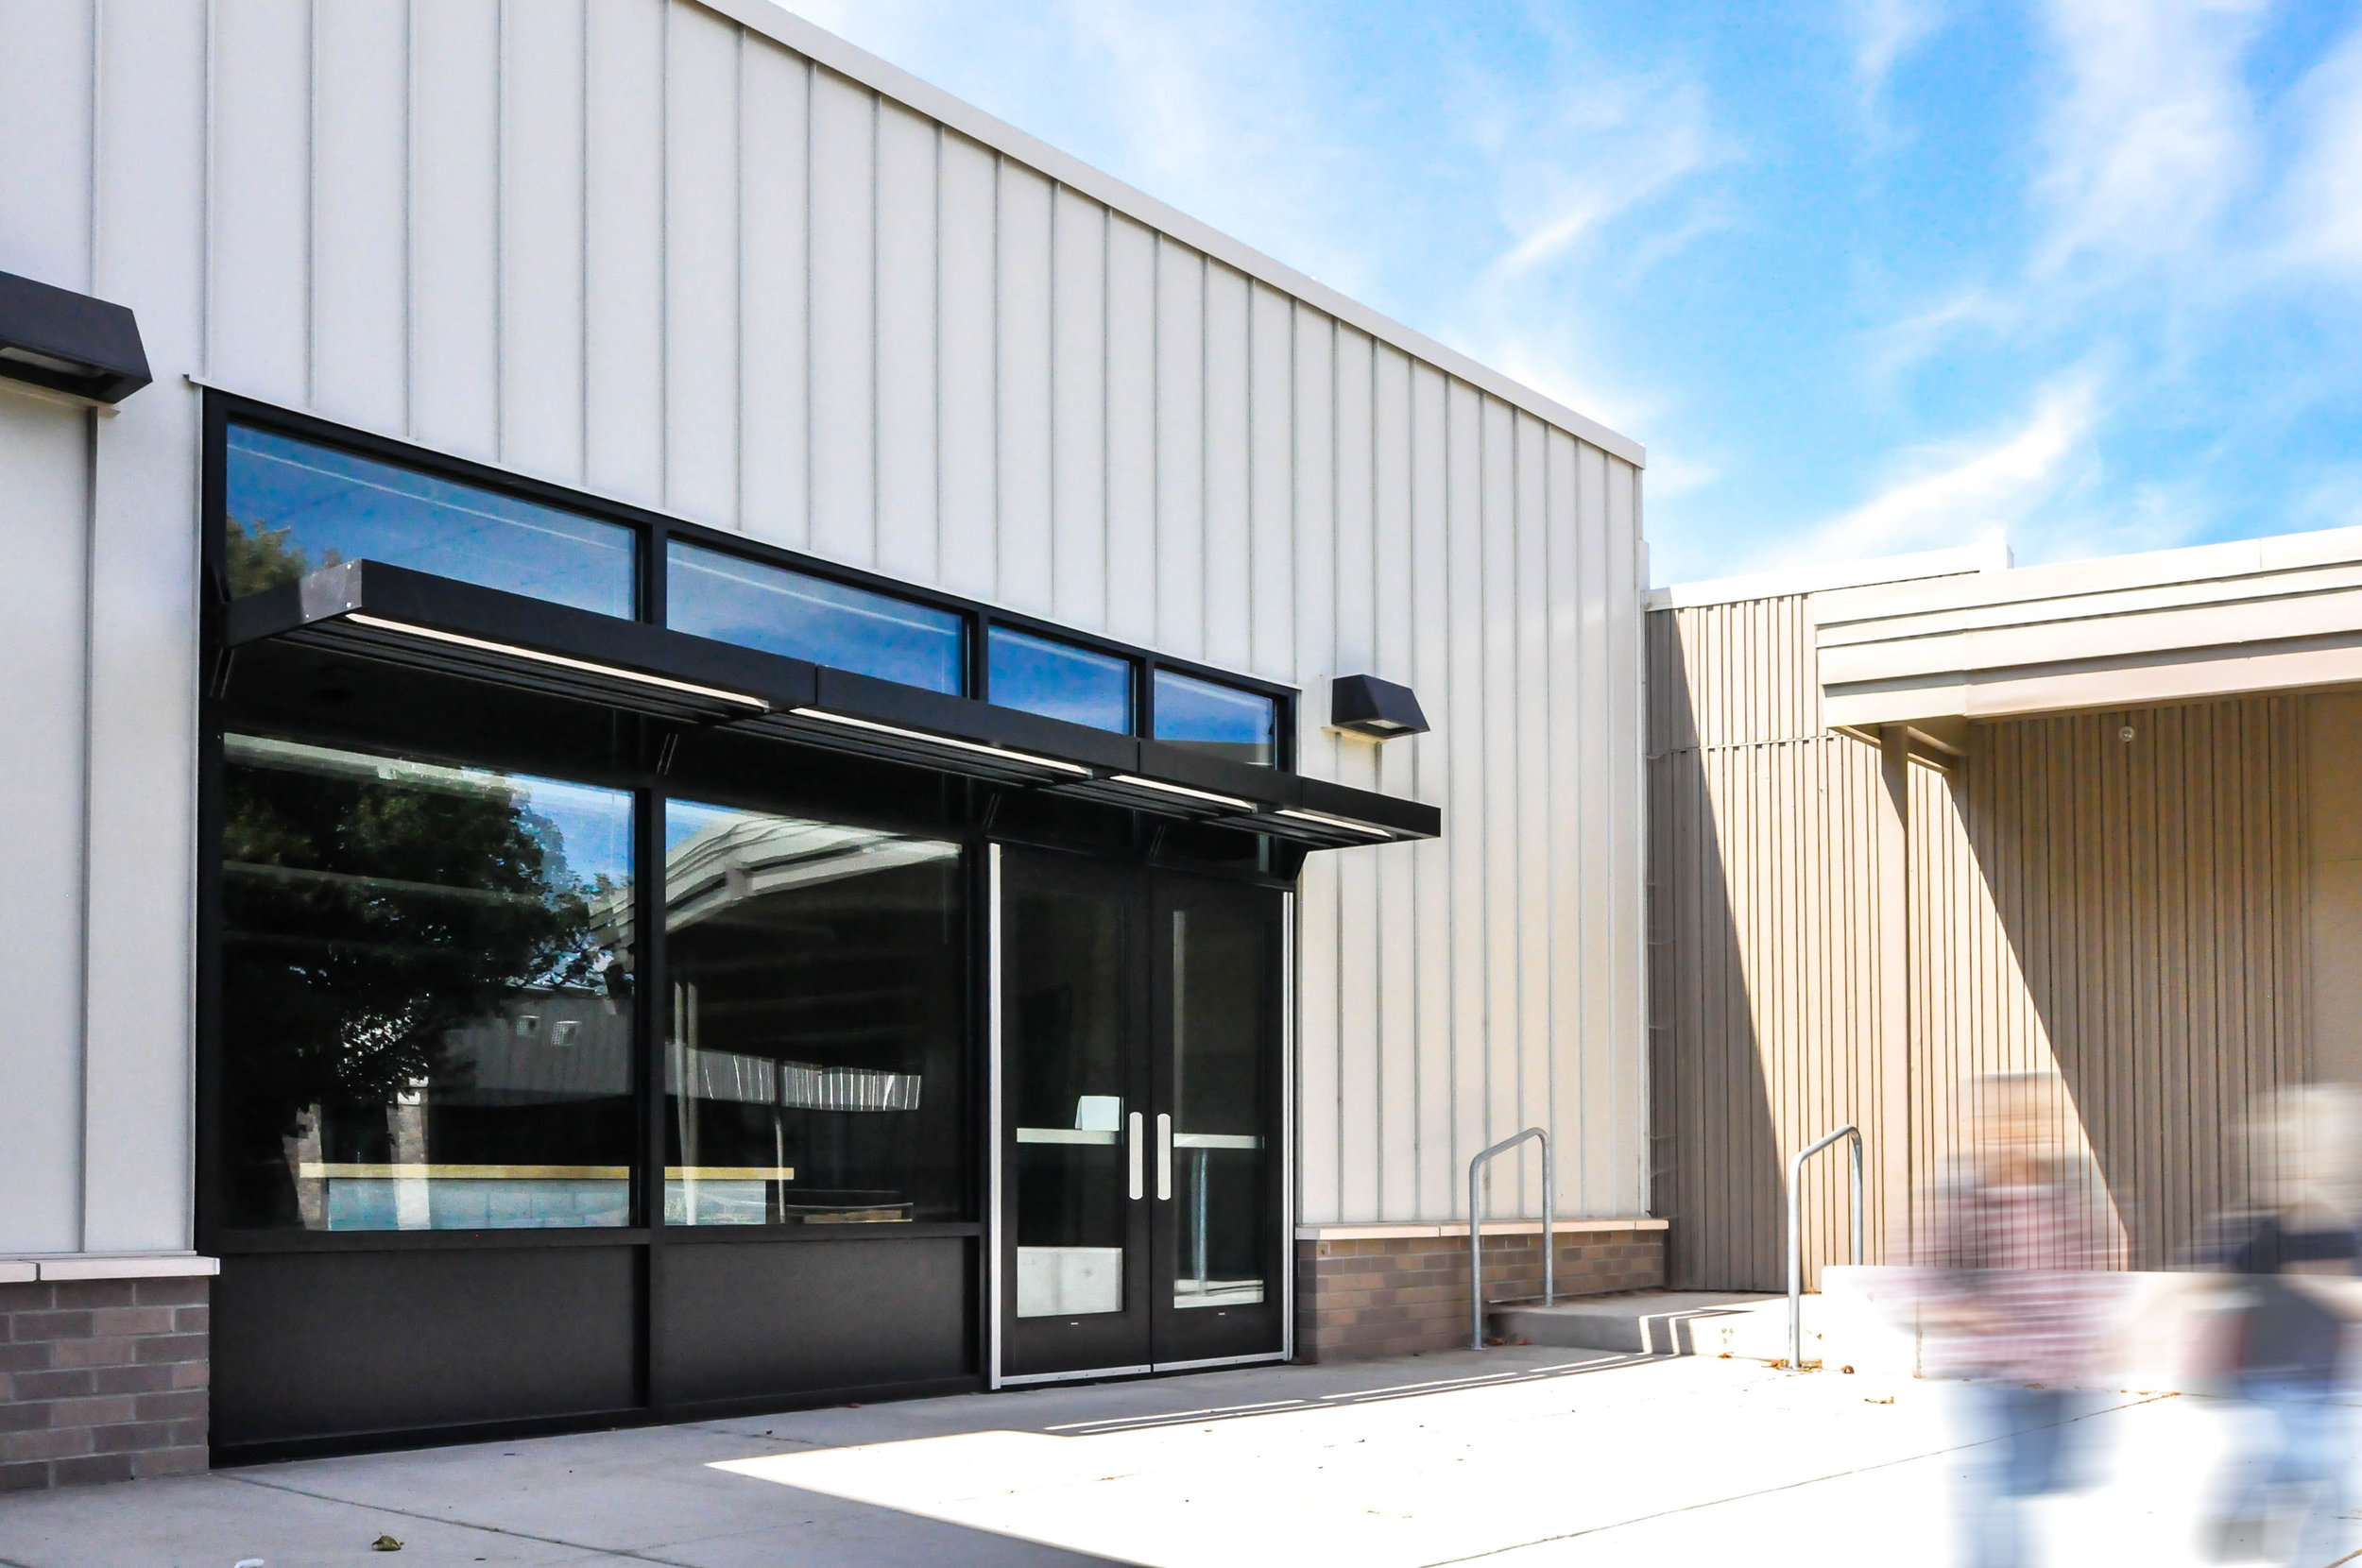 Gilham Elementary School - Exterior